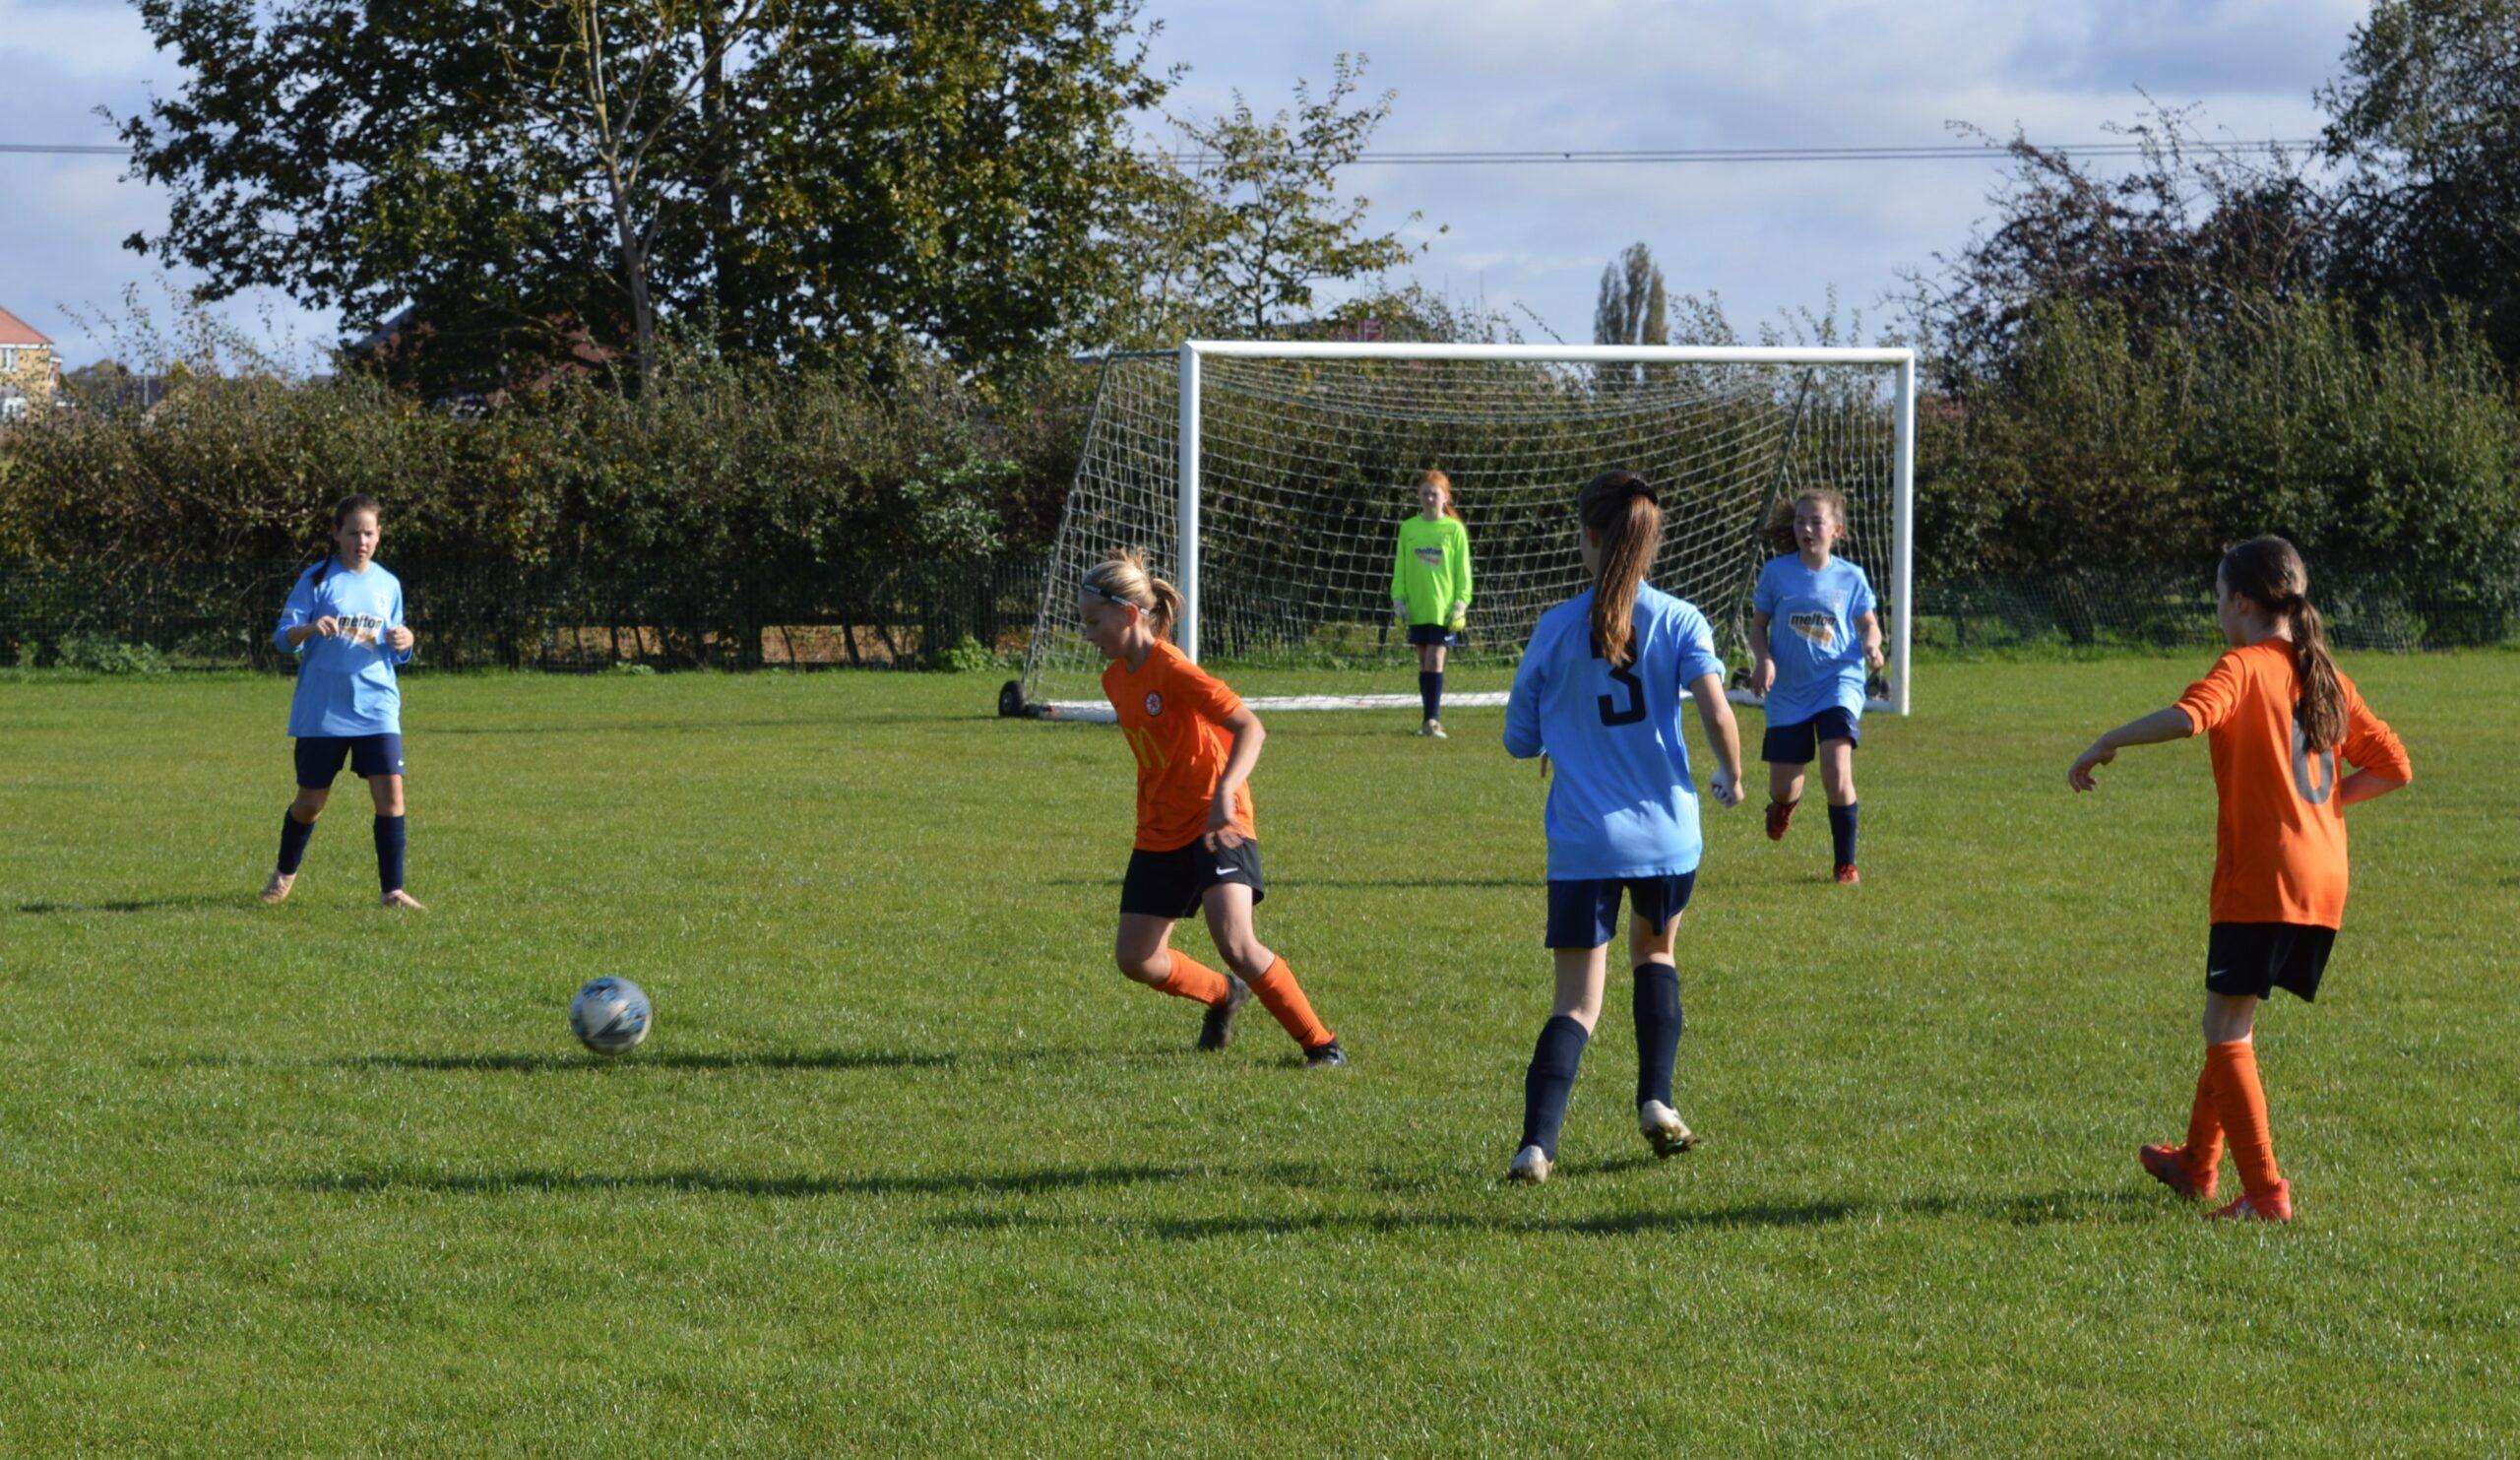 Asfordby Amateurs U12s vs Rugby Borough Girls U12s - Match Photo